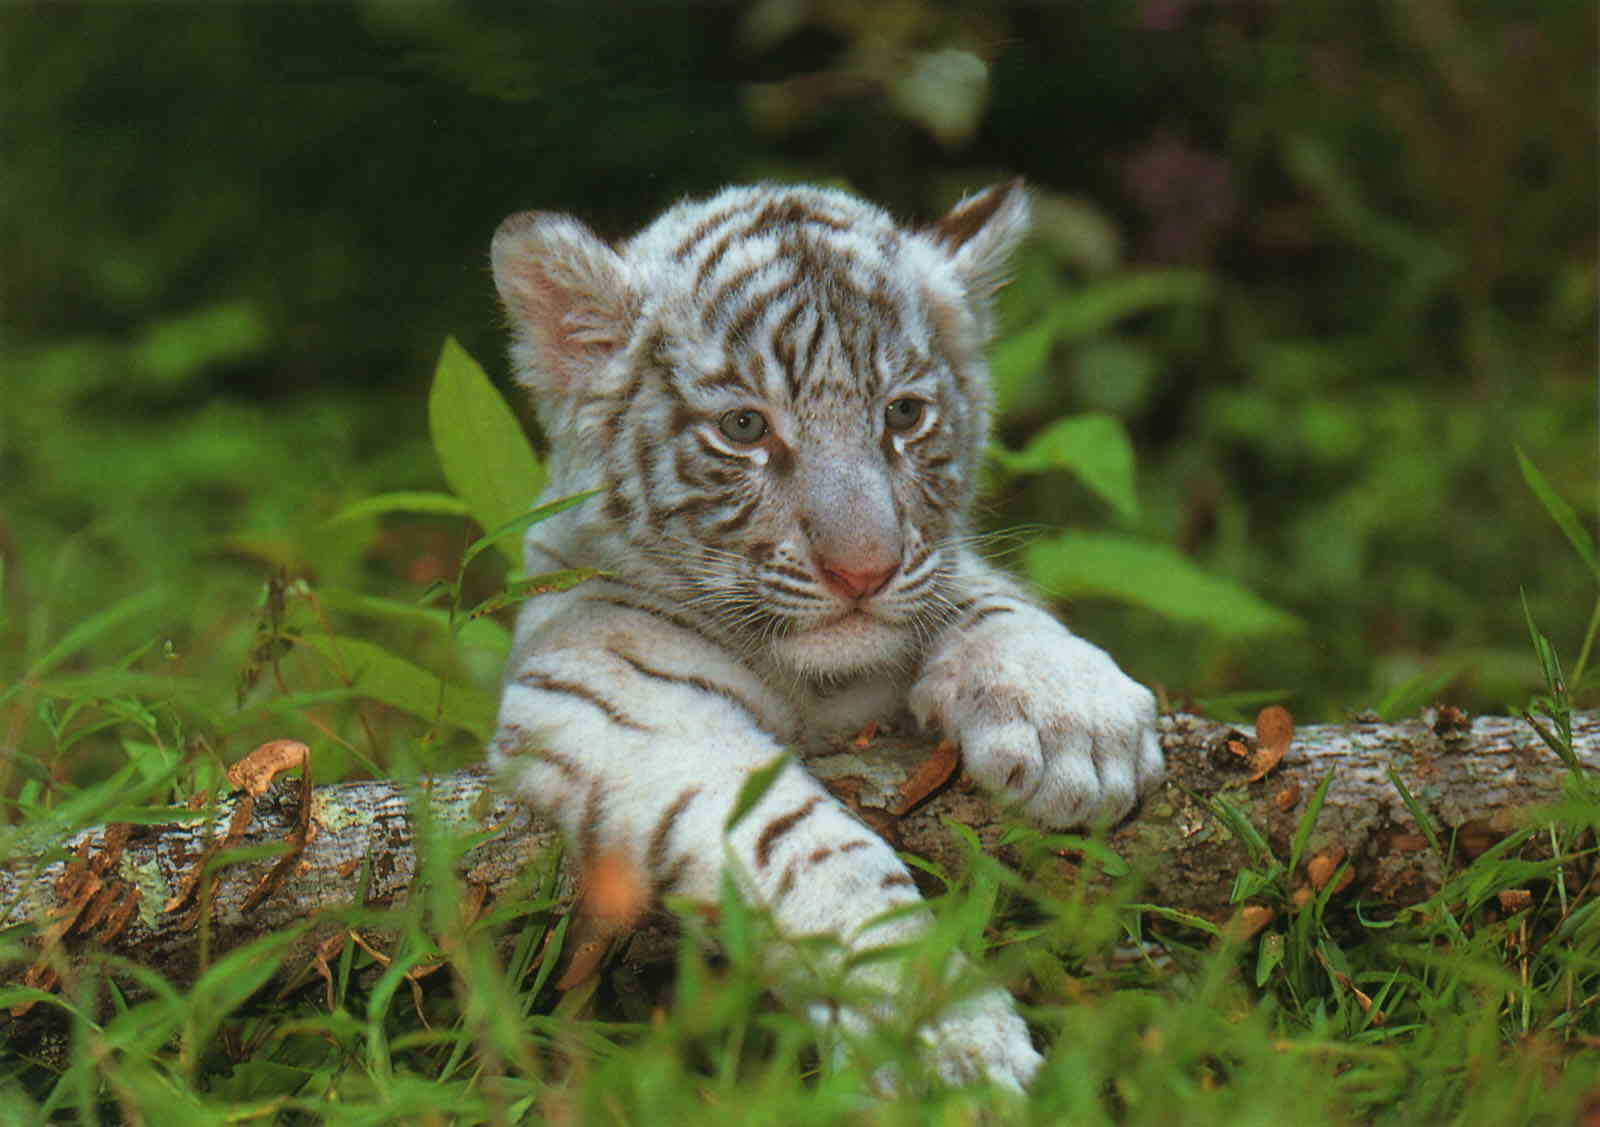 Le b b tigre - Photo de tigre a imprimer ...